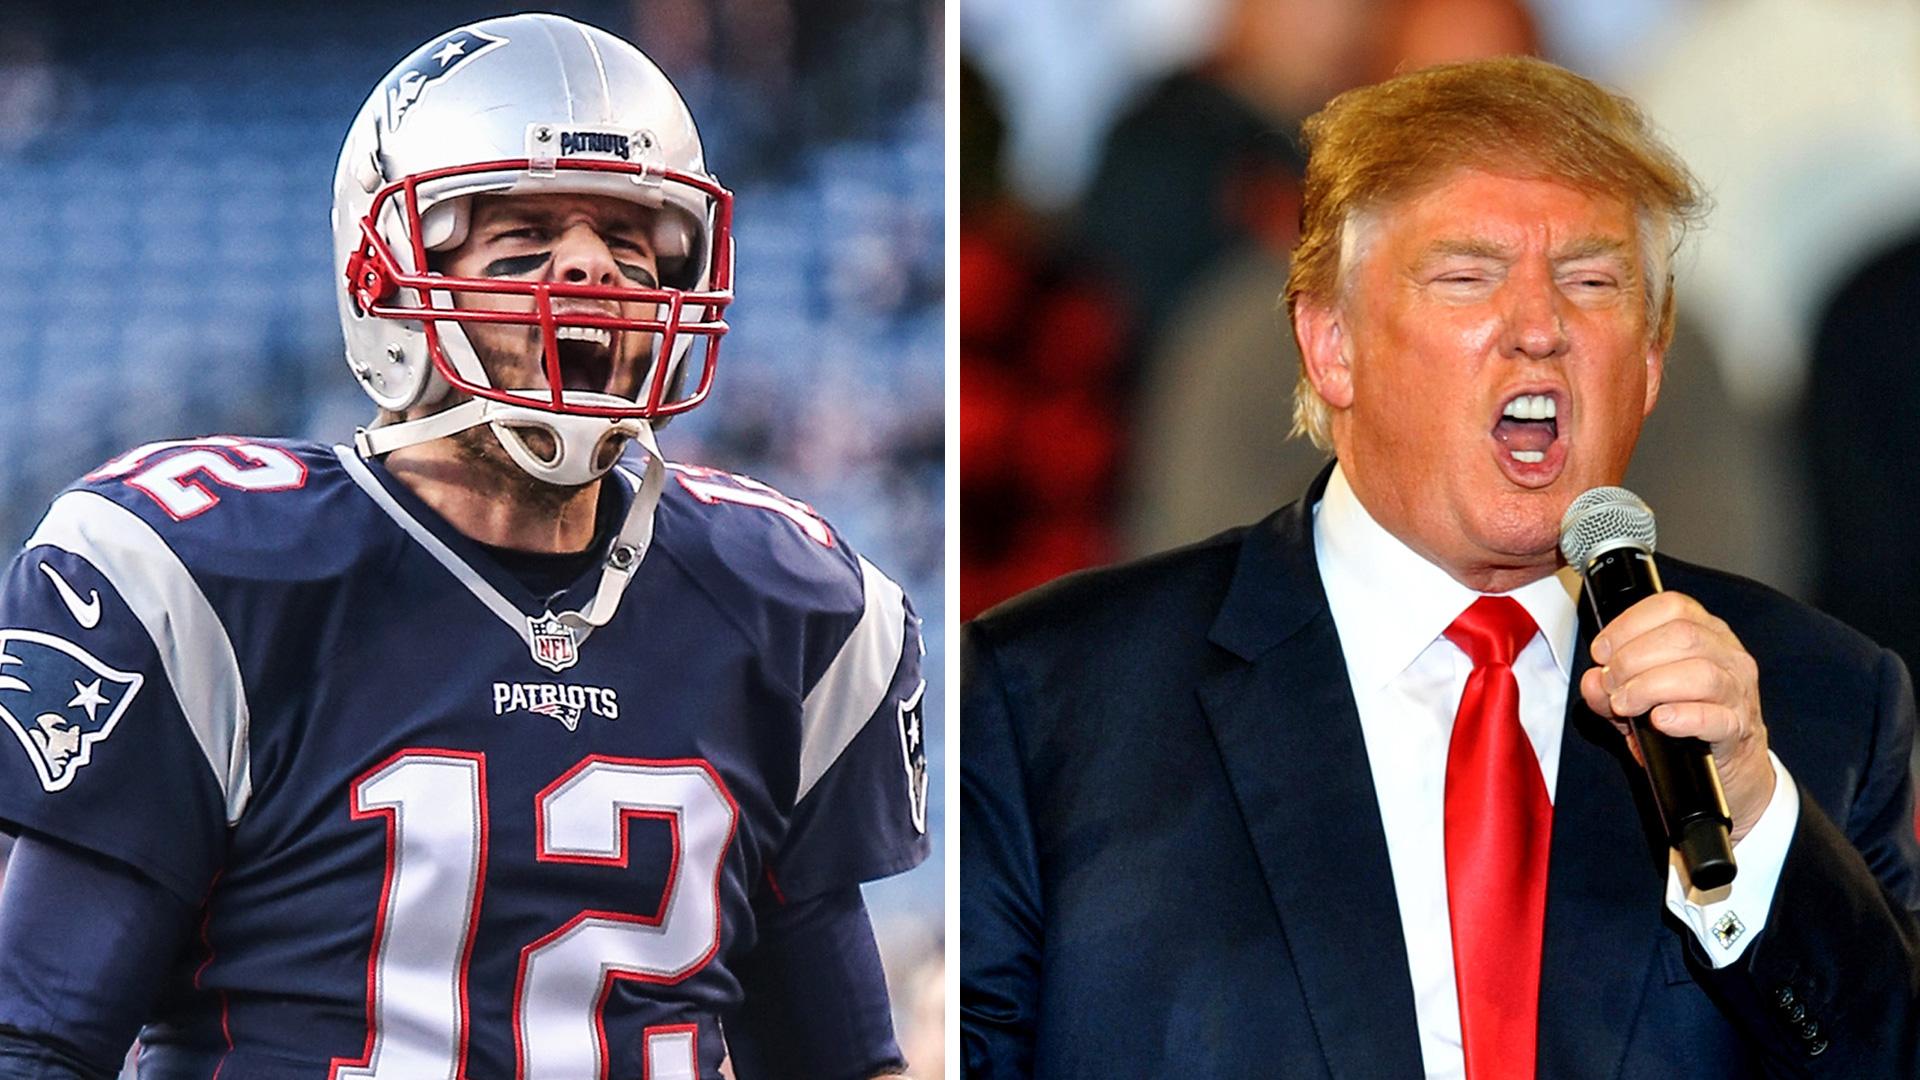 SPLIT-Brady-Trump-121515-Getty-FTR.jpg